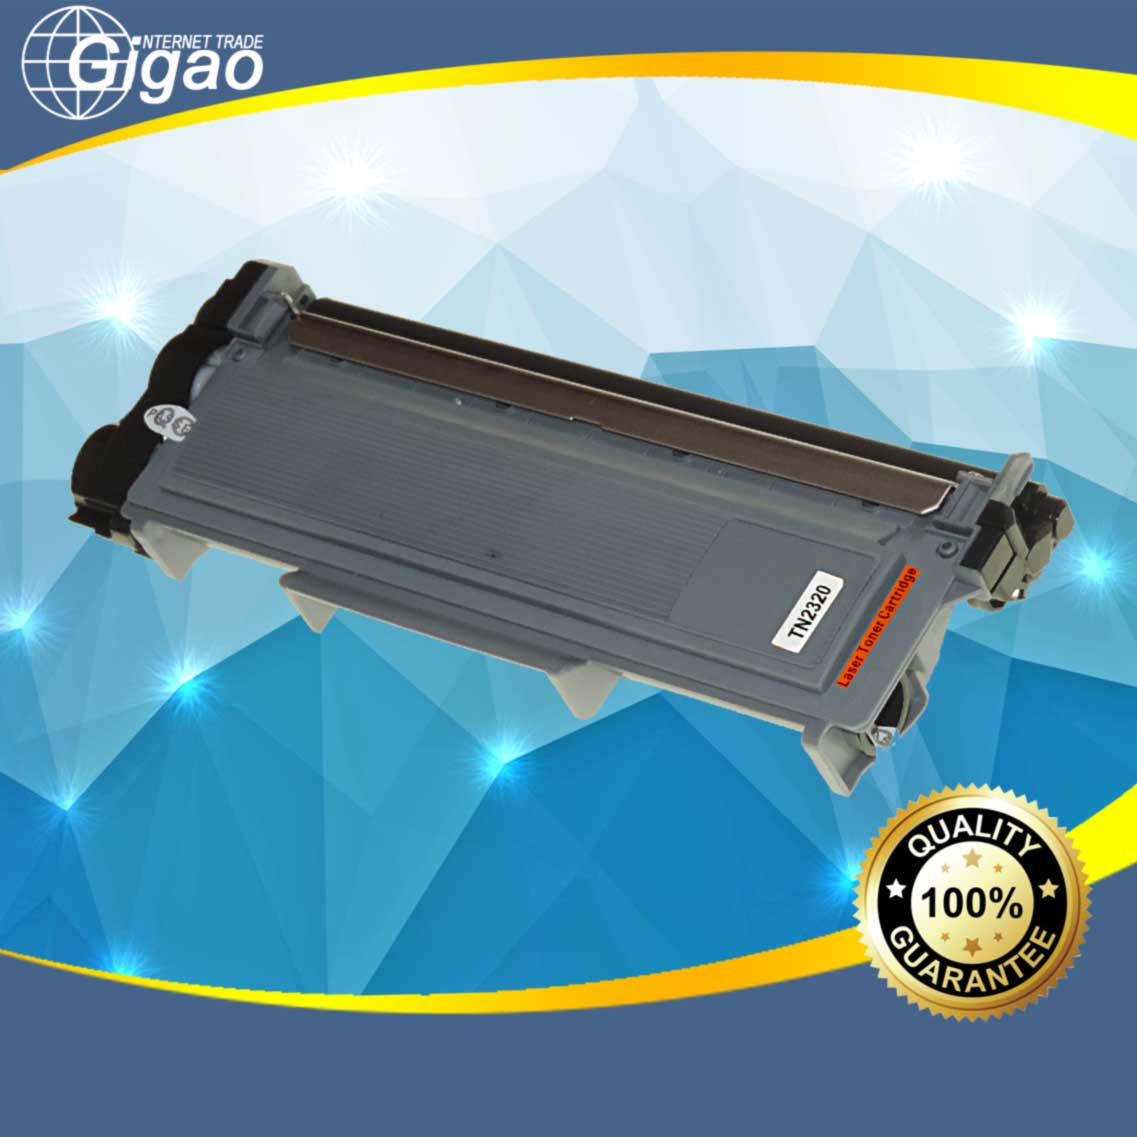 Gigao Laser Tonerkassette kompatibel Brother TN-2320 für DCP-L2520DW